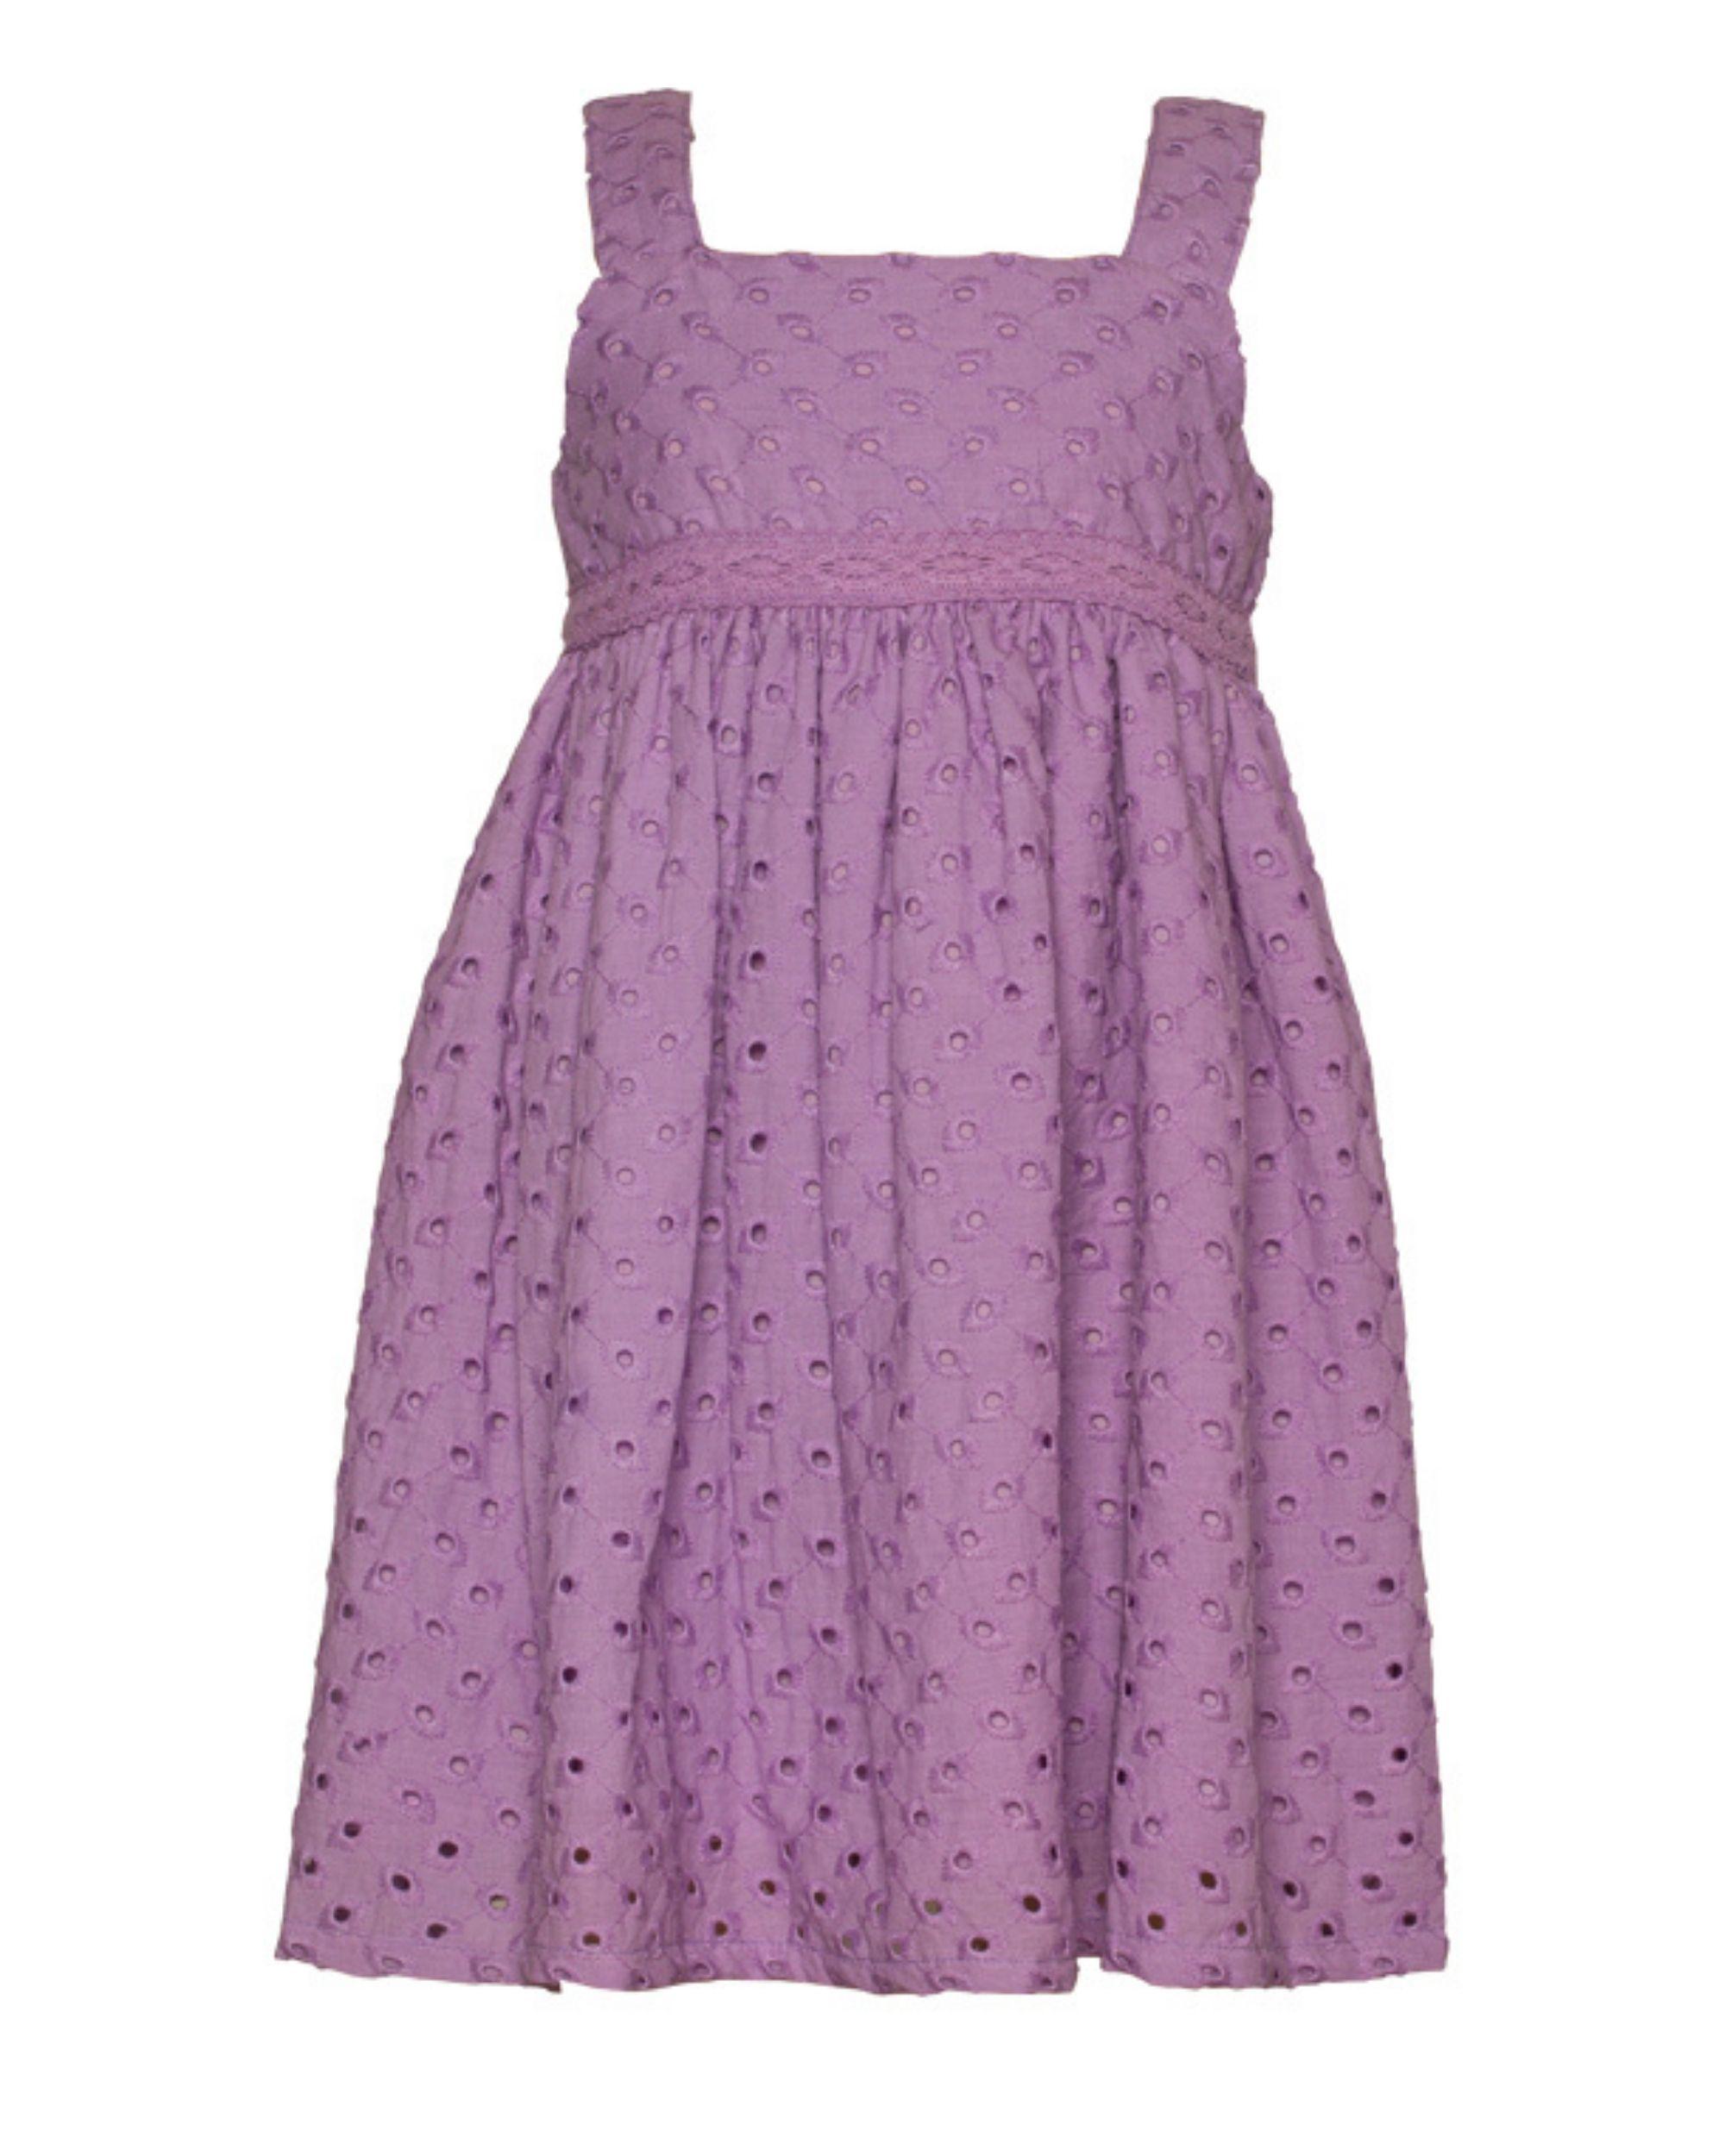 Lavender gathered cutwork strap dress